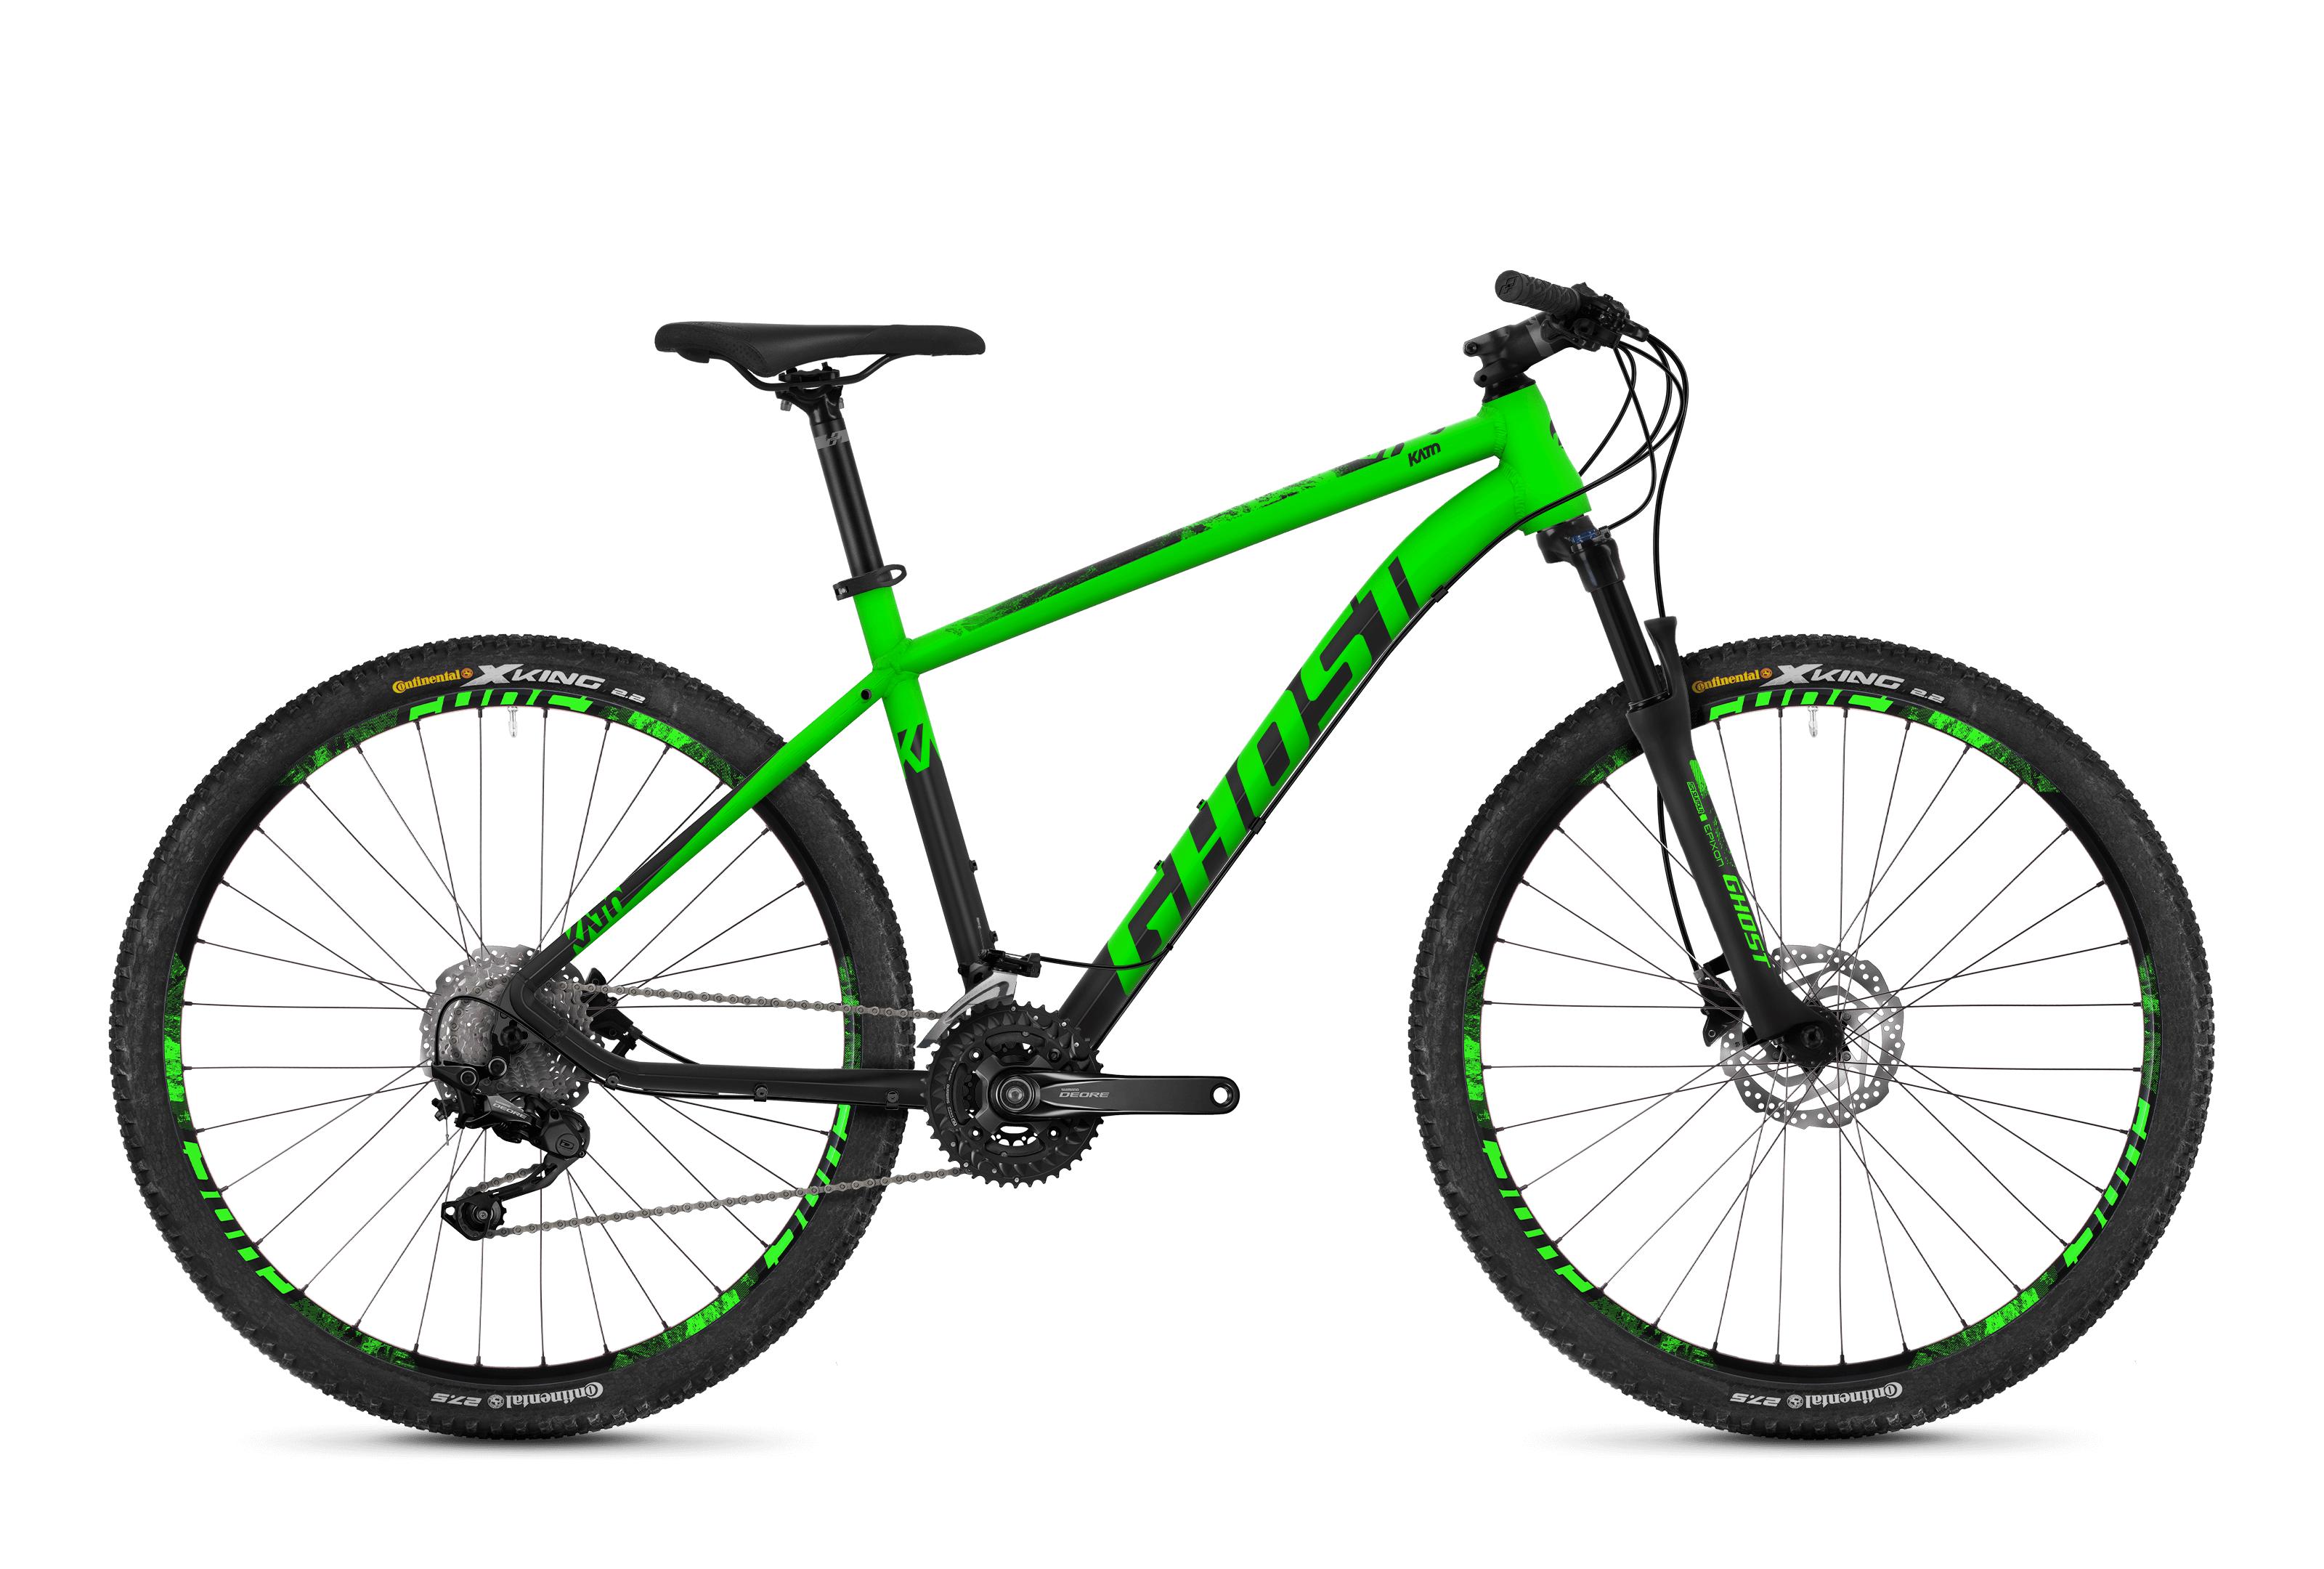 Horské kolo GHOST Kato 6.7 green / black S 2018